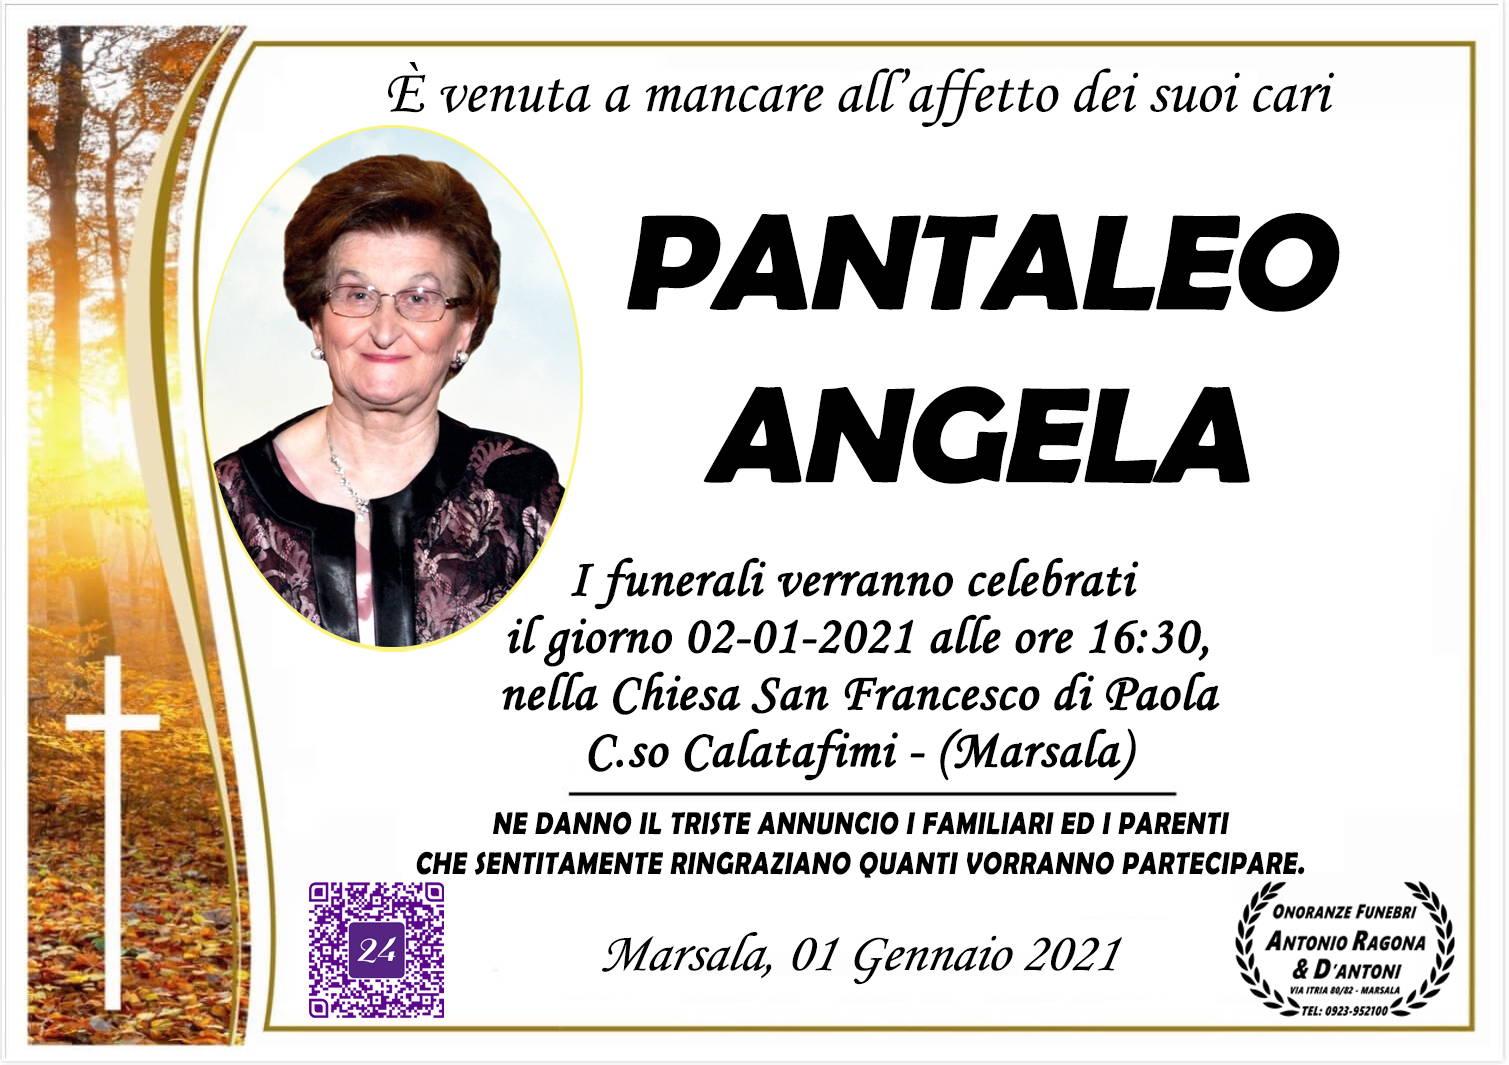 Angela Pantaleo